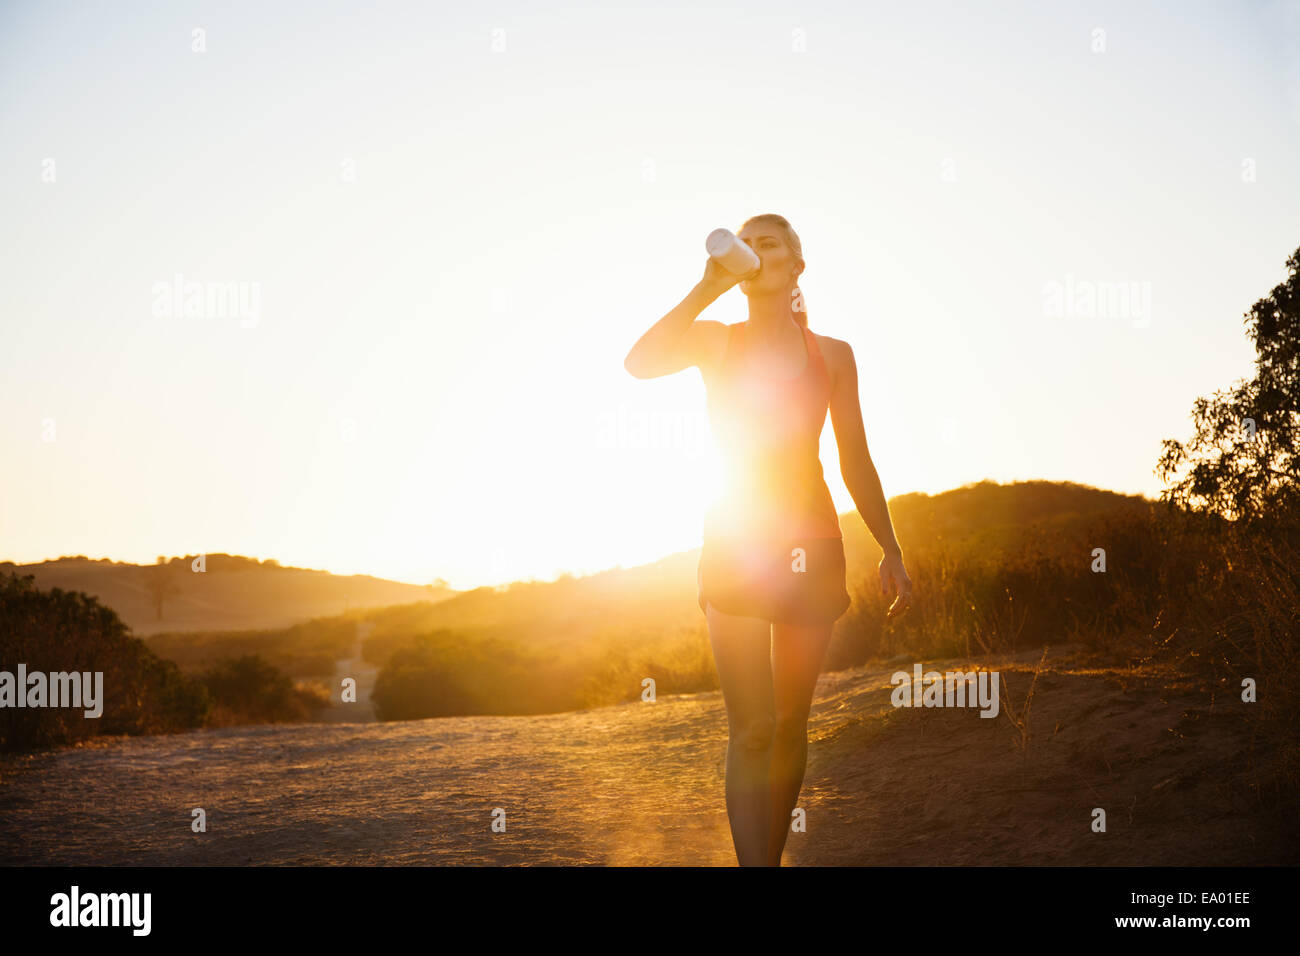 Pareggiatore femmina di bere in presenza di luce solare, Portland, CA, Stati Uniti d'America Immagini Stock